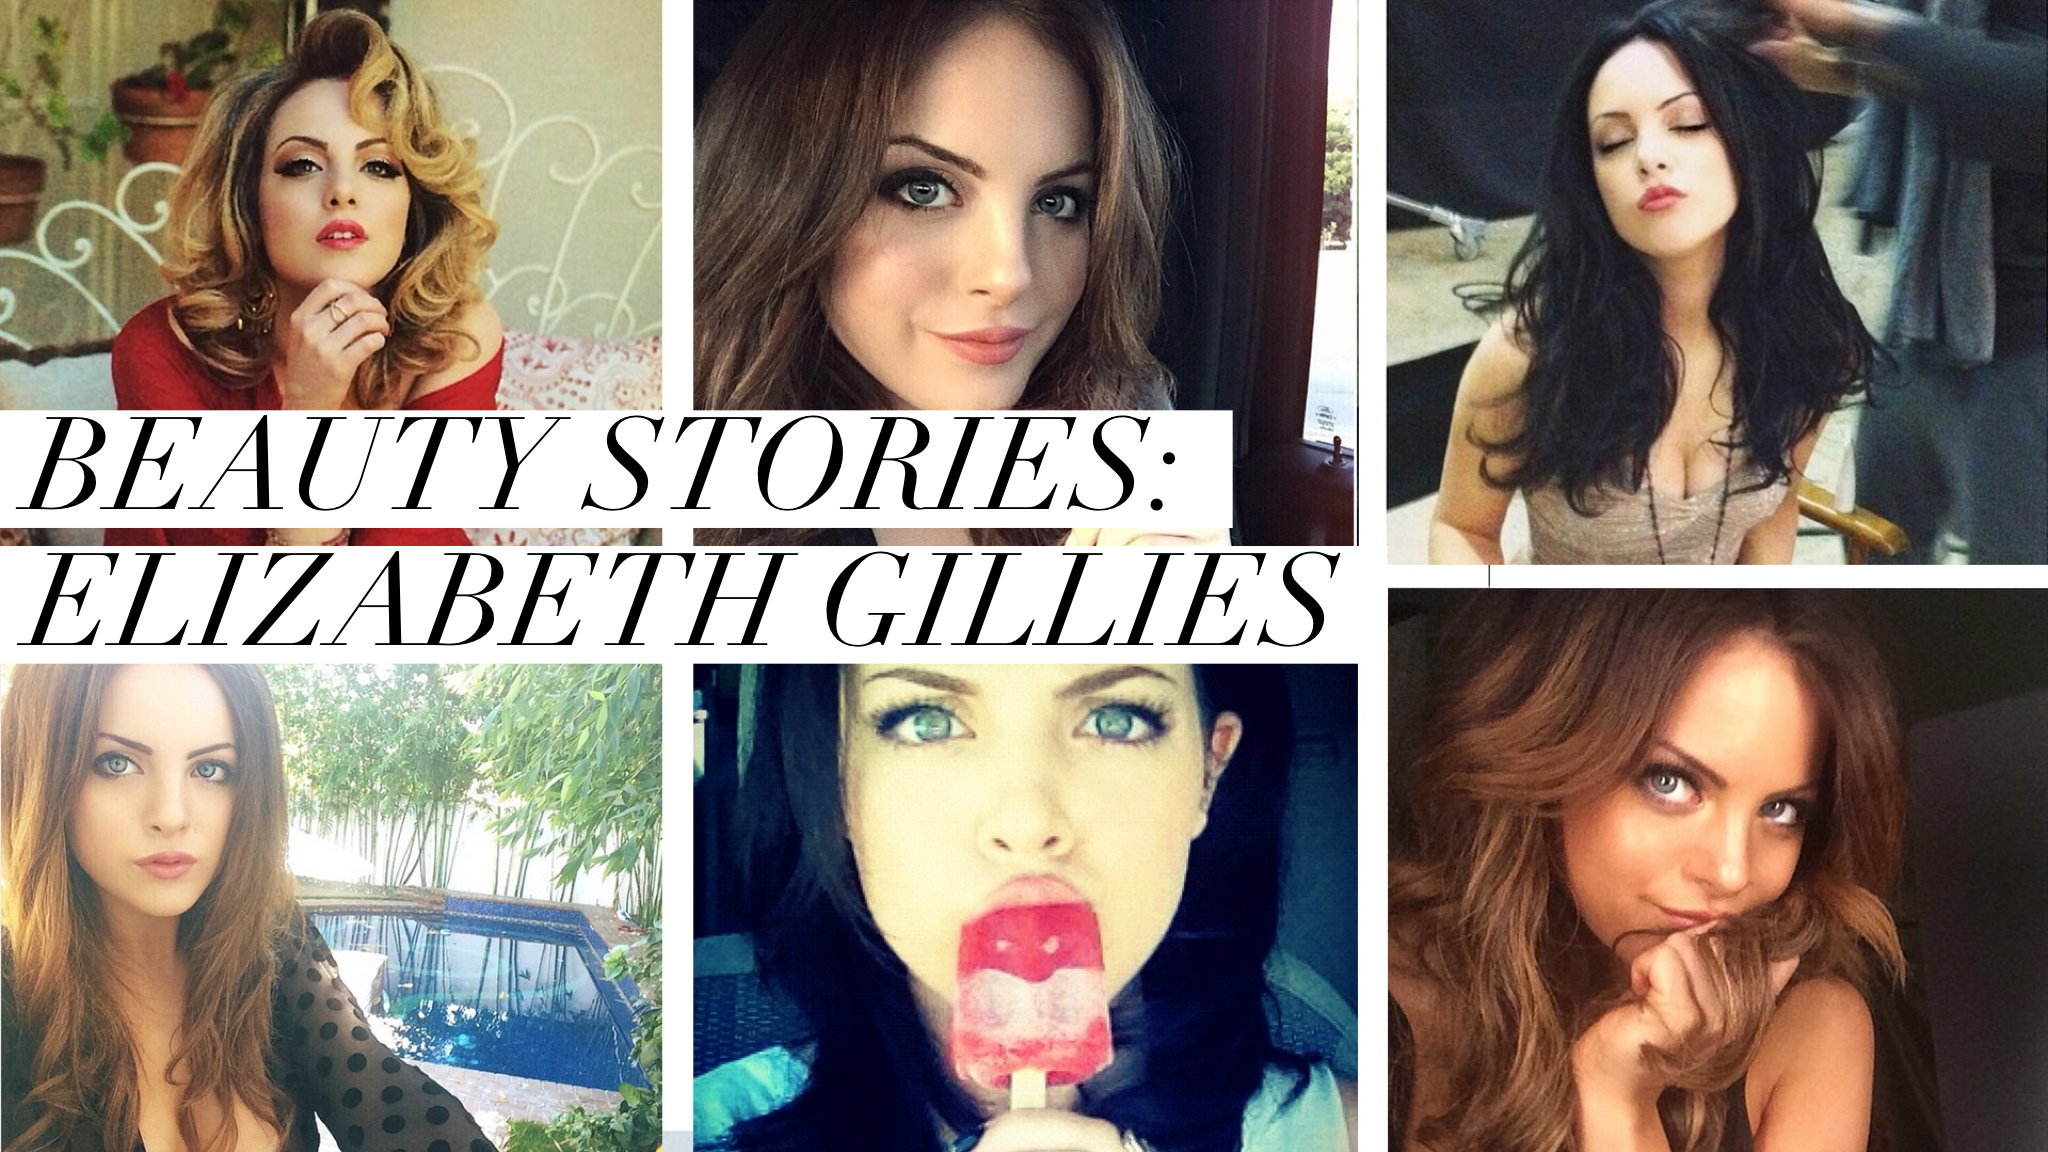 Elizabeth gillies sex stories